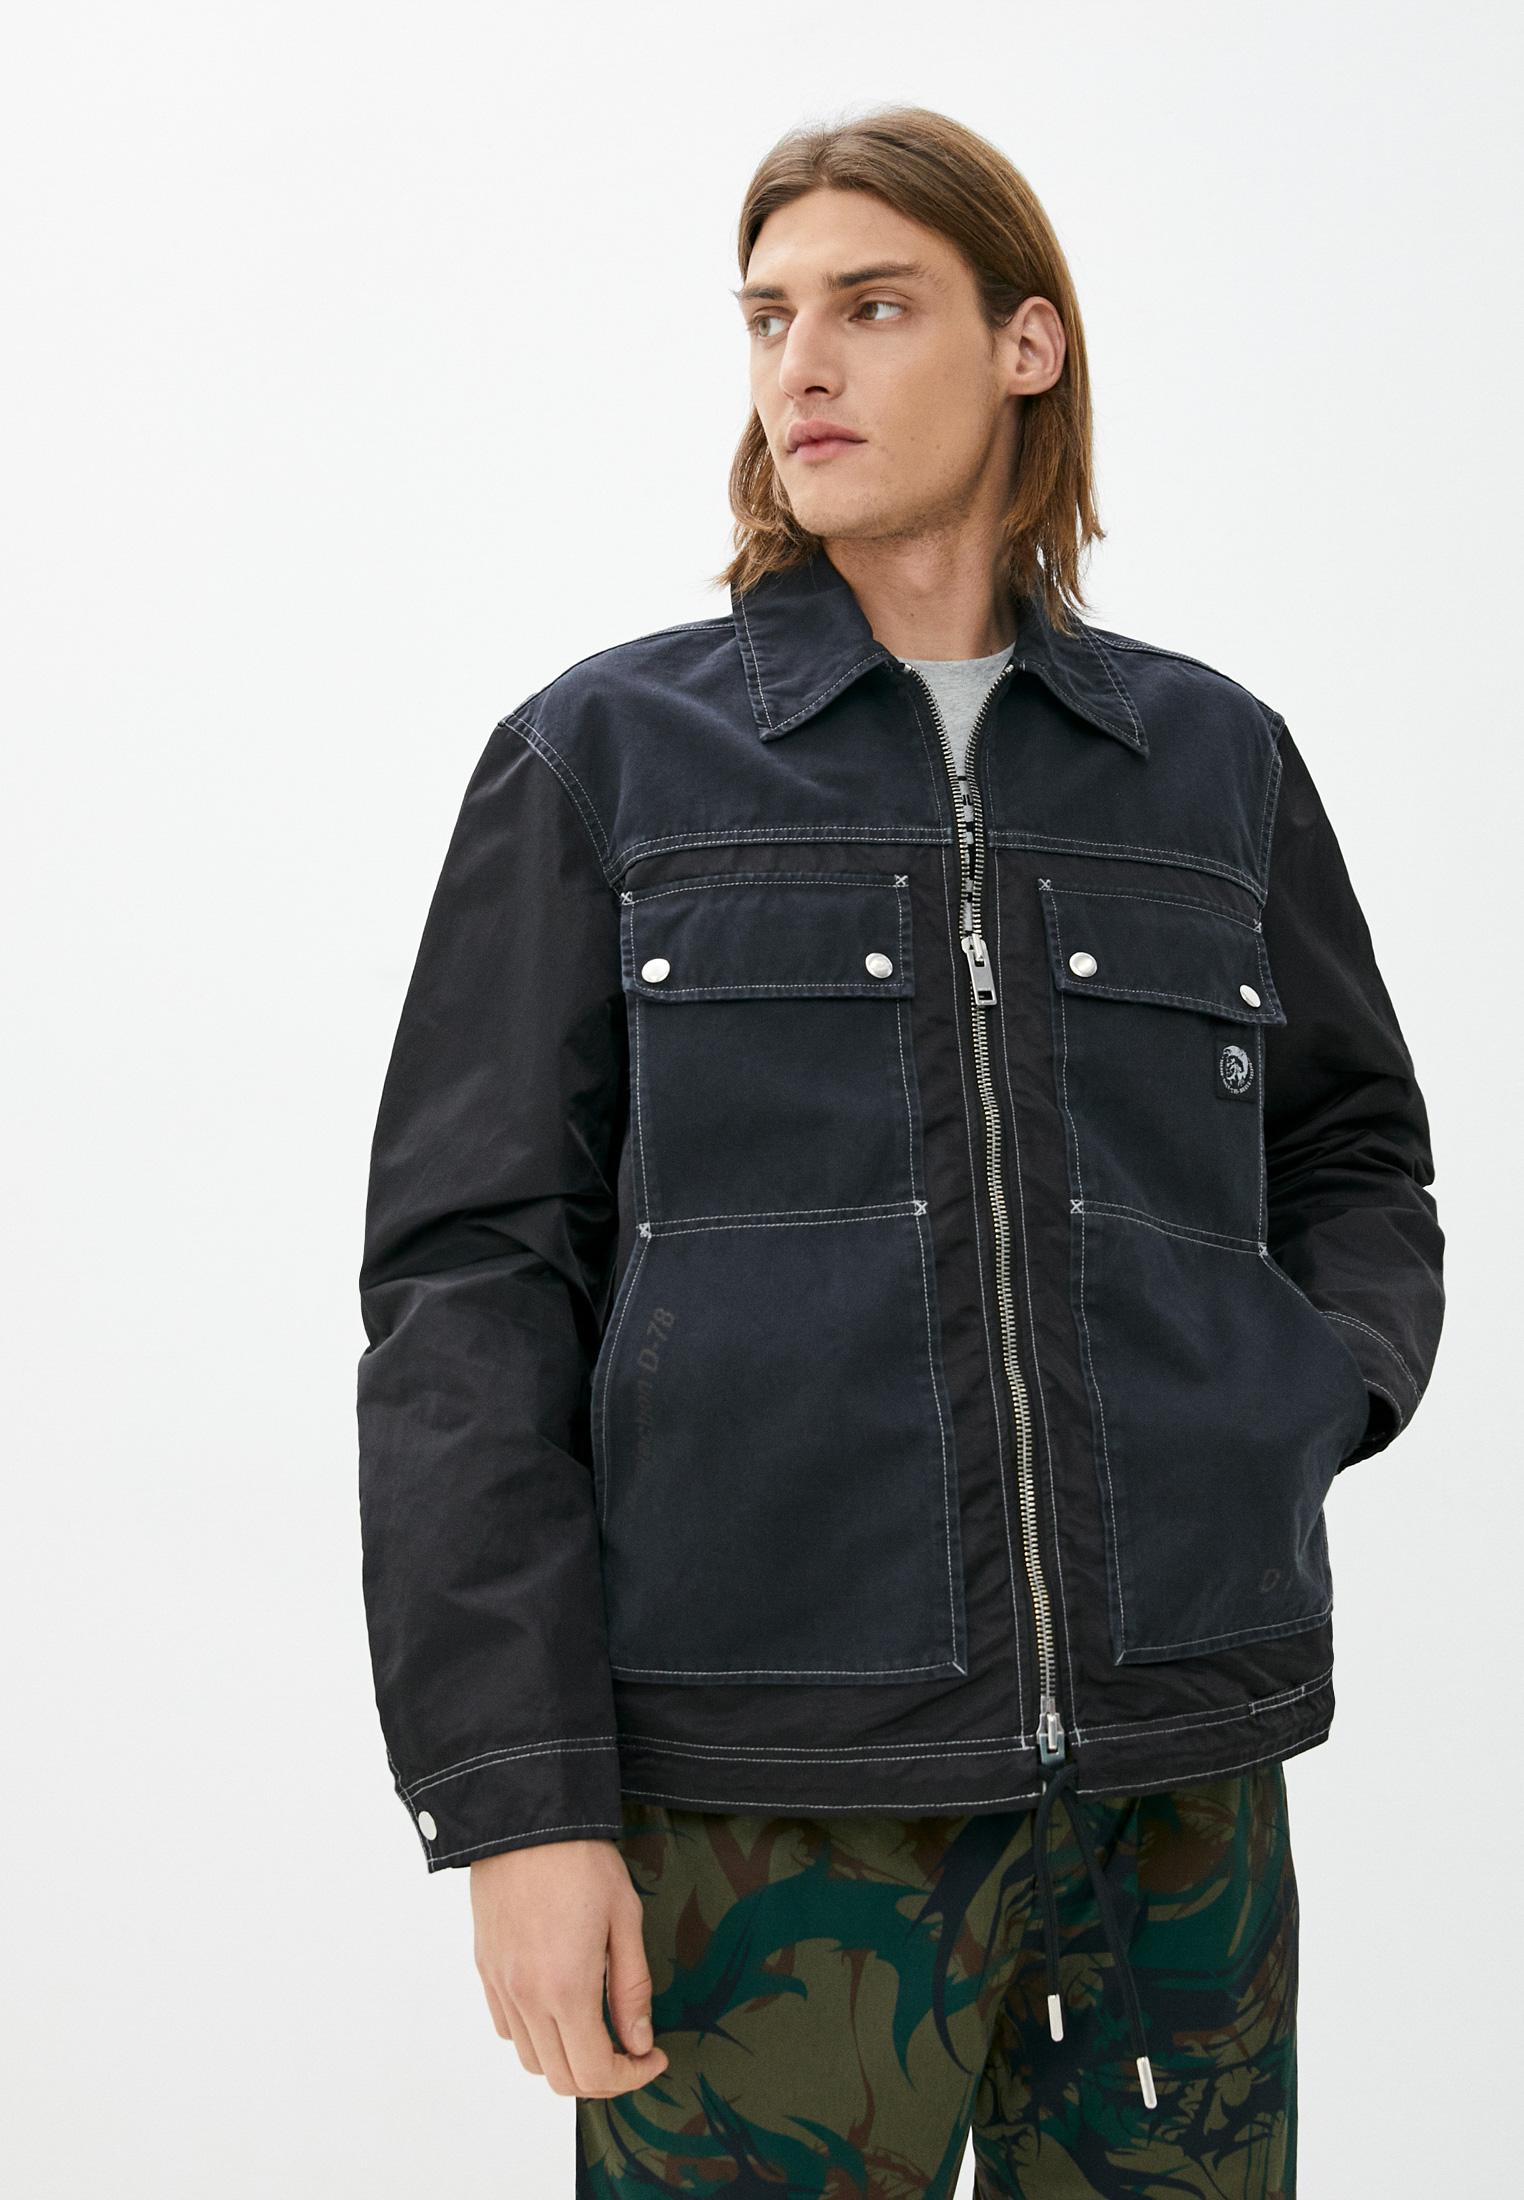 Джинсовая куртка Diesel (Дизель) Куртка джинсовая Diesel